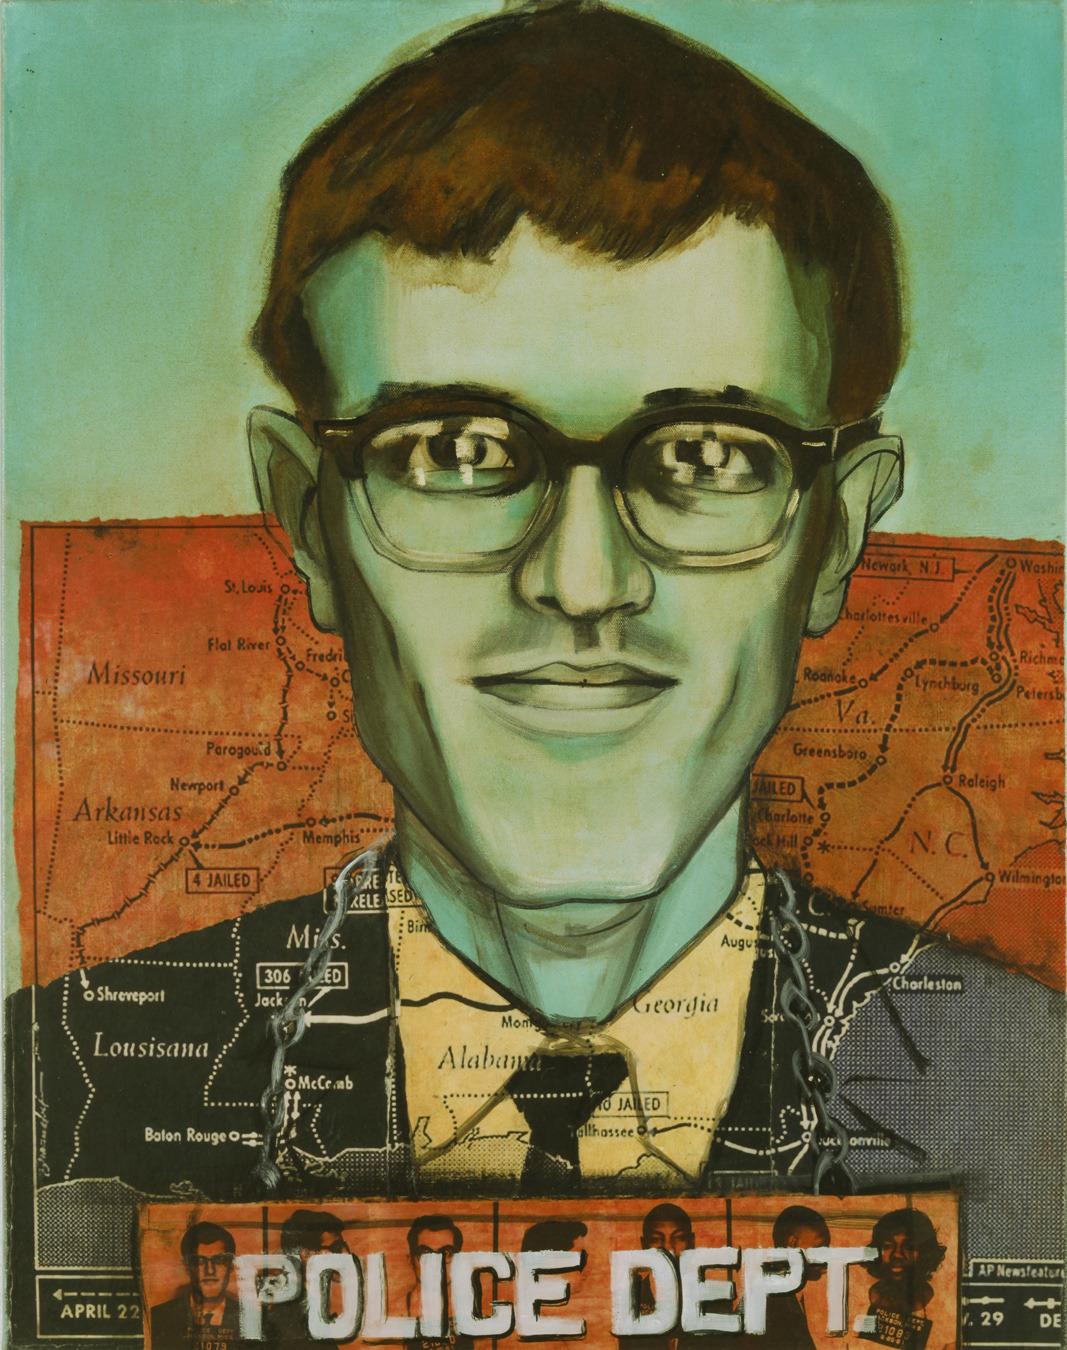 Arrested June 25, 1961 in Jackson, MS: Frank Nelson, 22